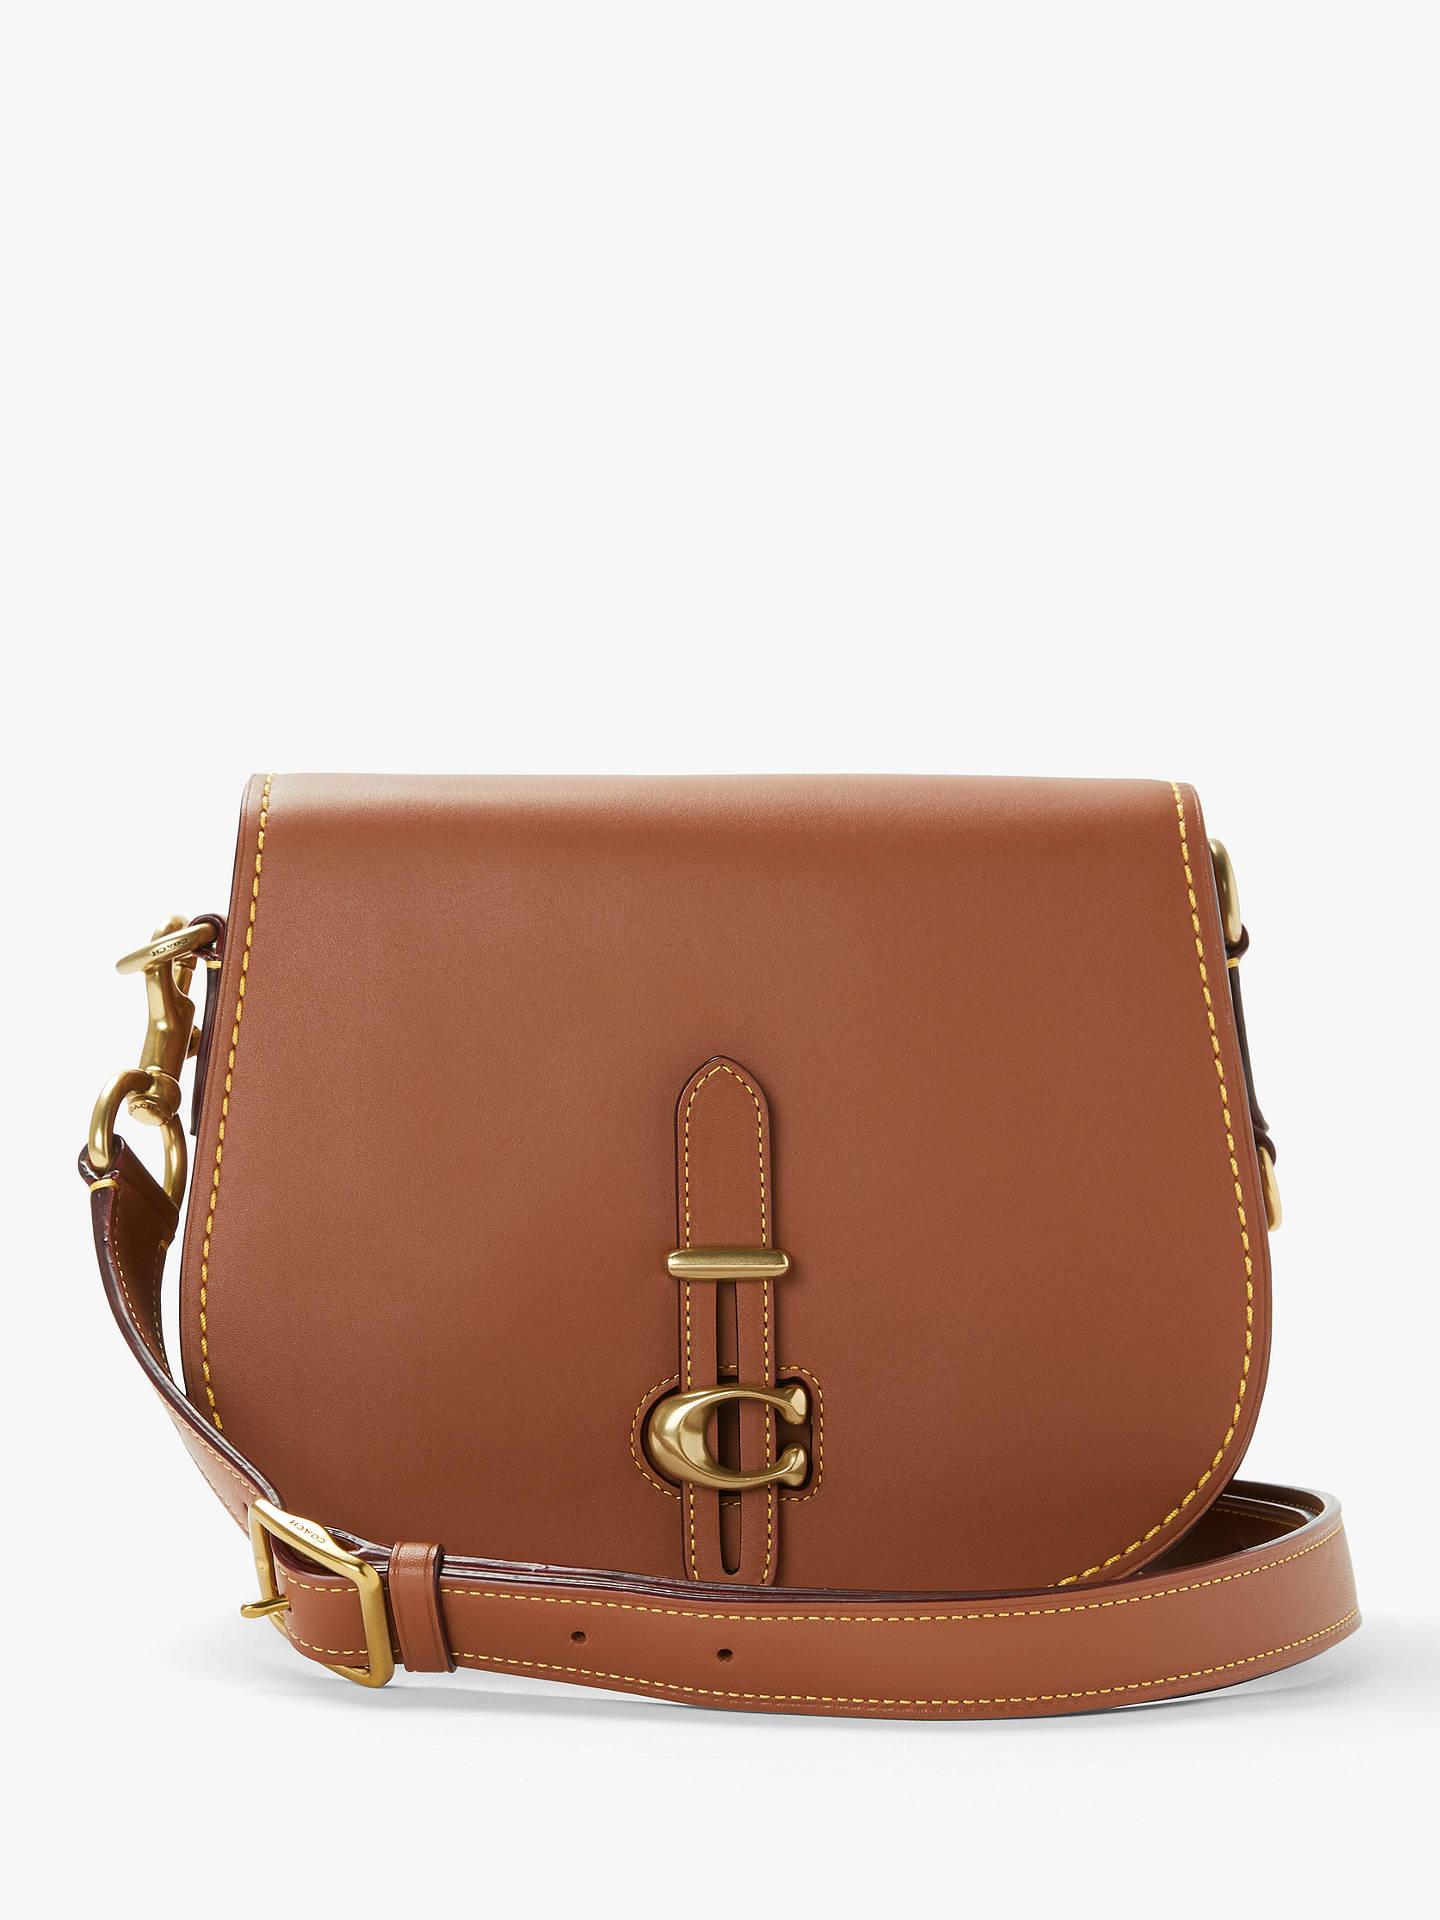 01d06851198c Buy Coach Leather Saddle Bag